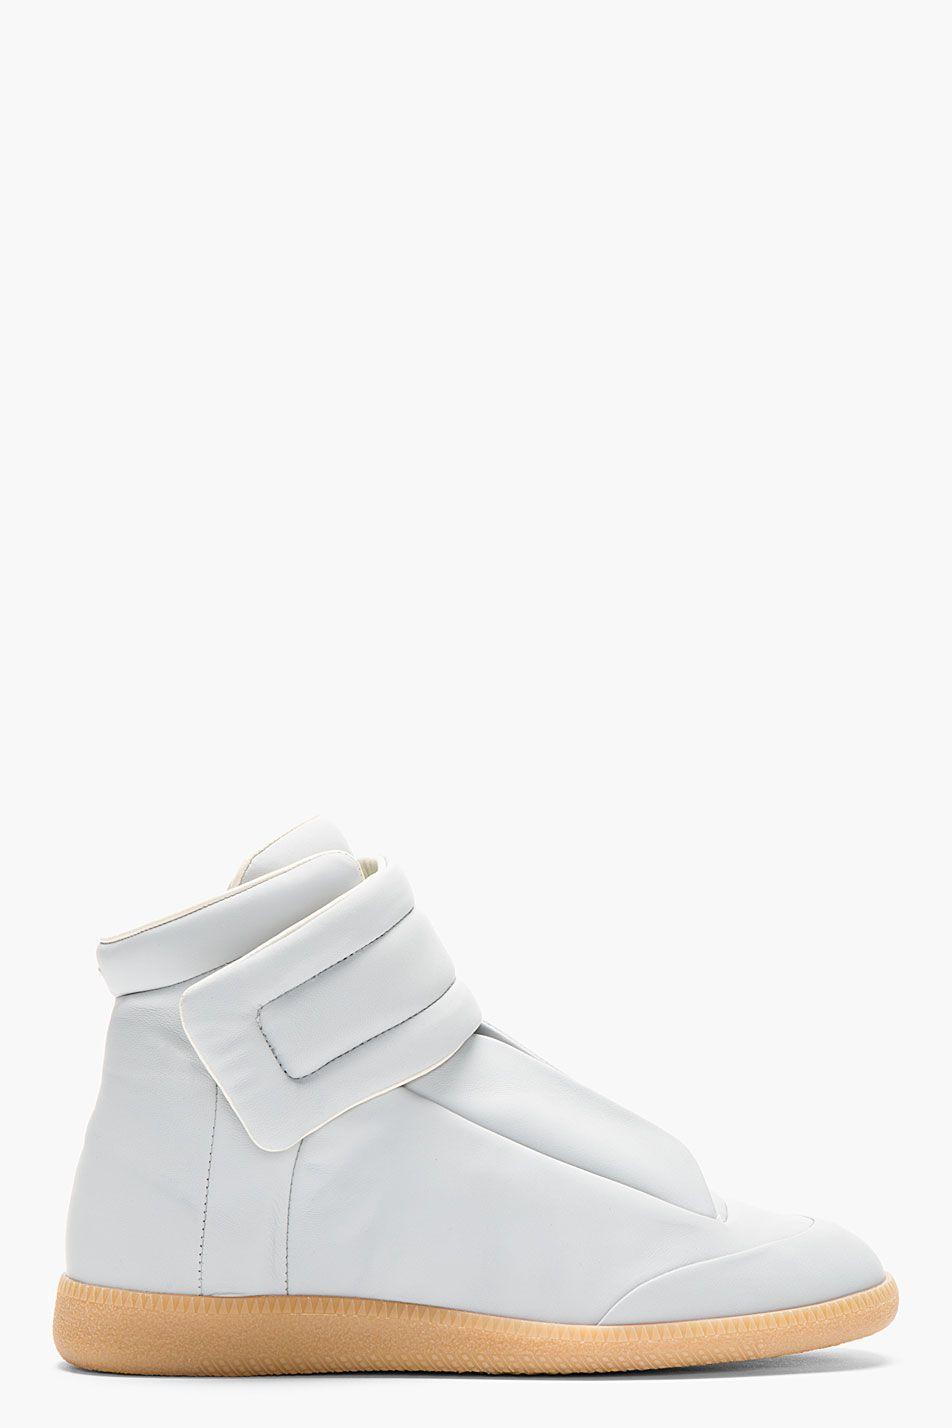 Buy Cheap High Men Sneakers Sneakers High mens Light grey HIGH Mens Sneakers